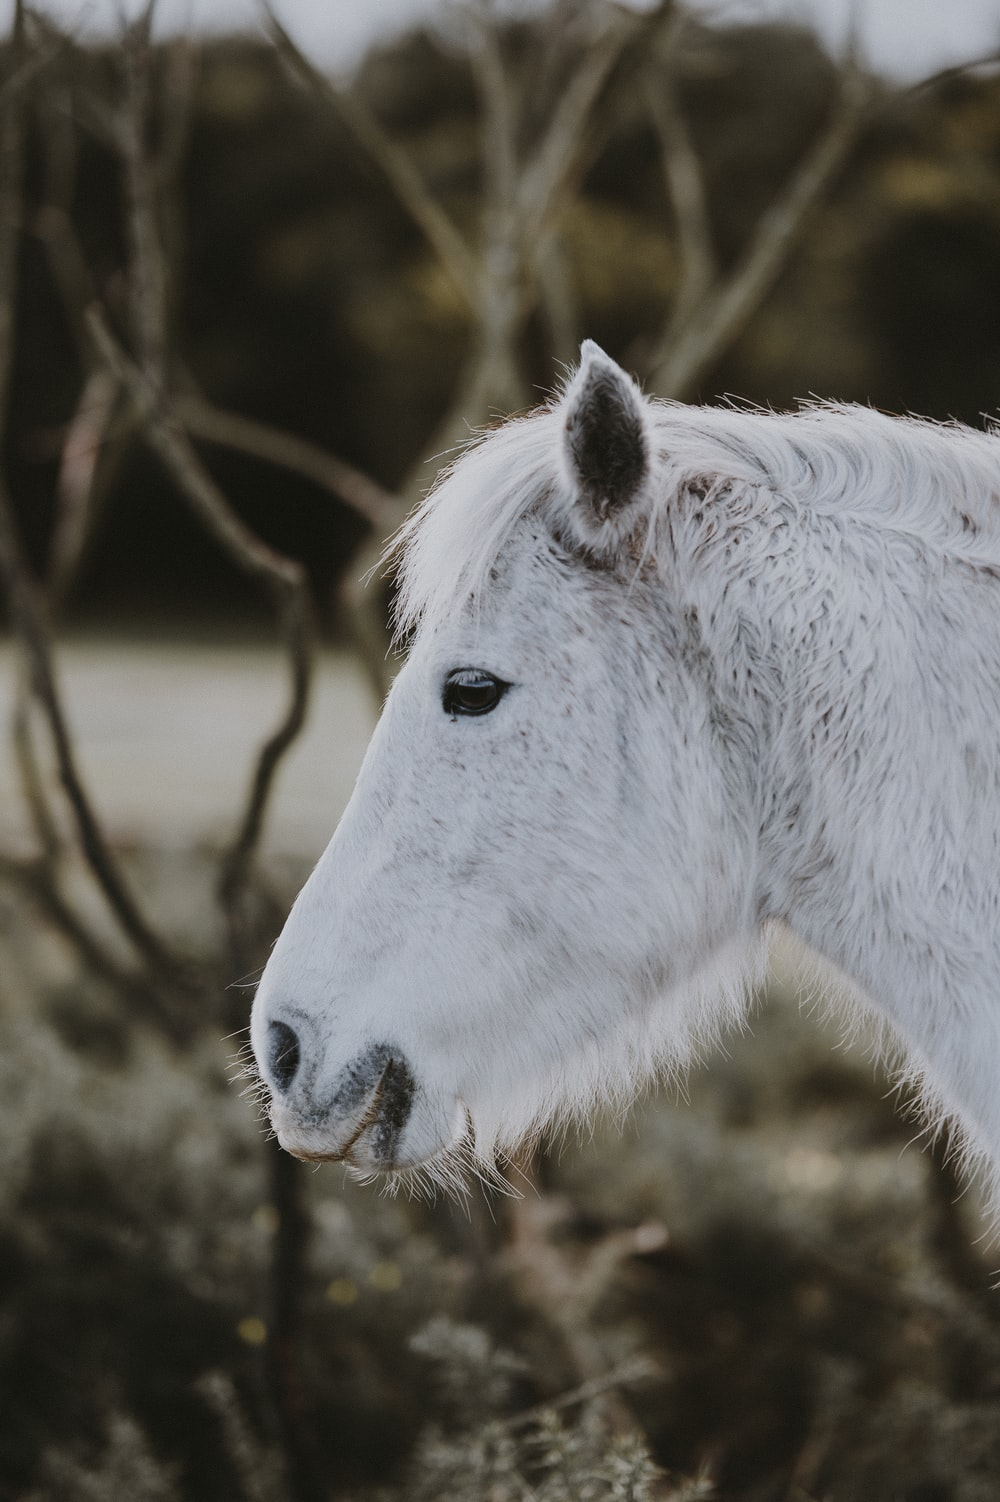 closeup photo of white horse head